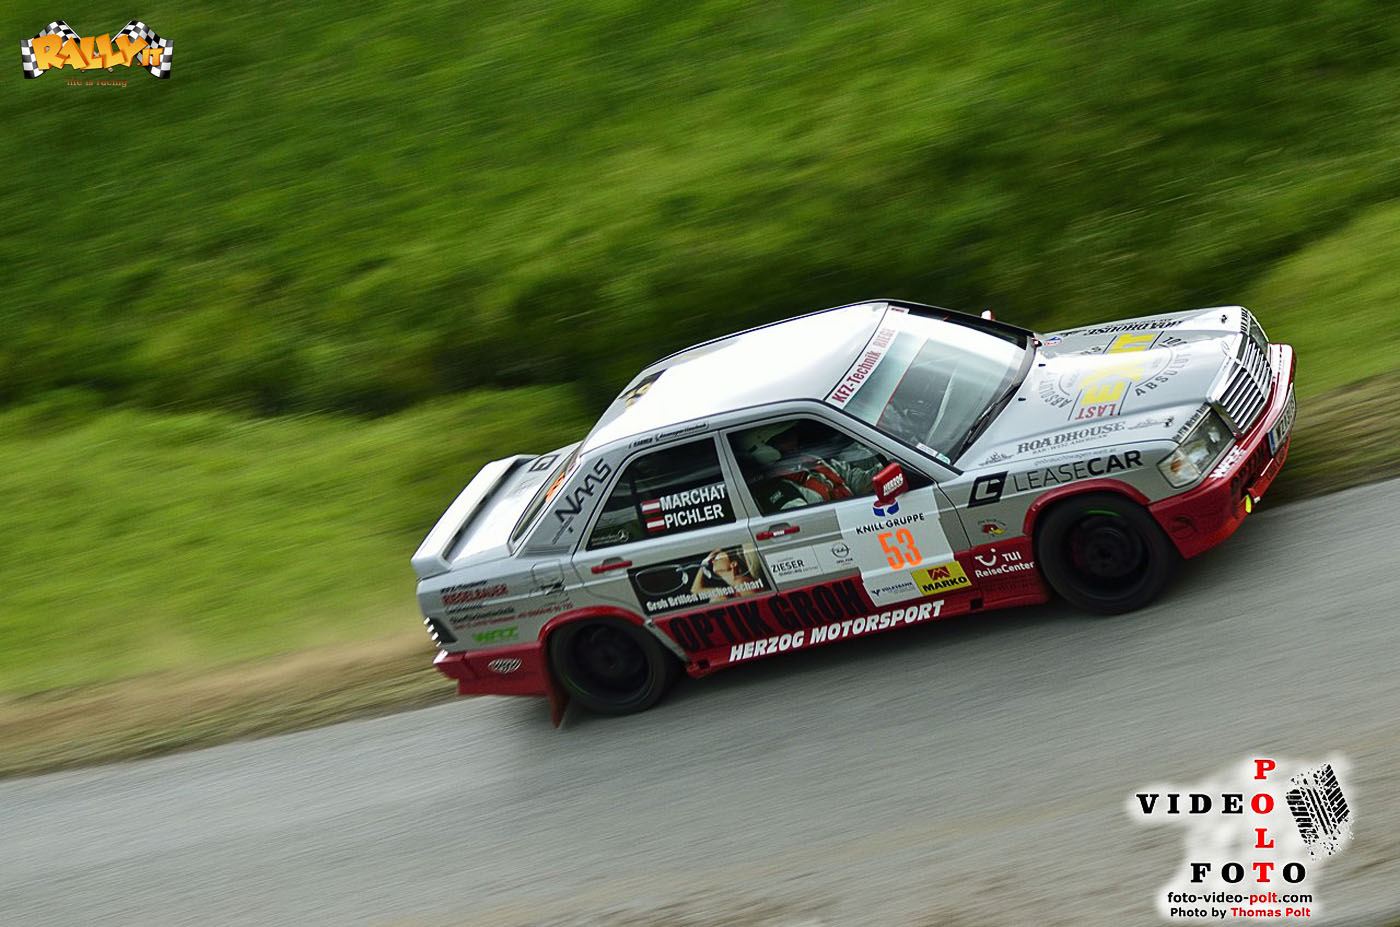 001-ORM Rallye Weiz-2014-Thomas Polt-Rally-it.jpg